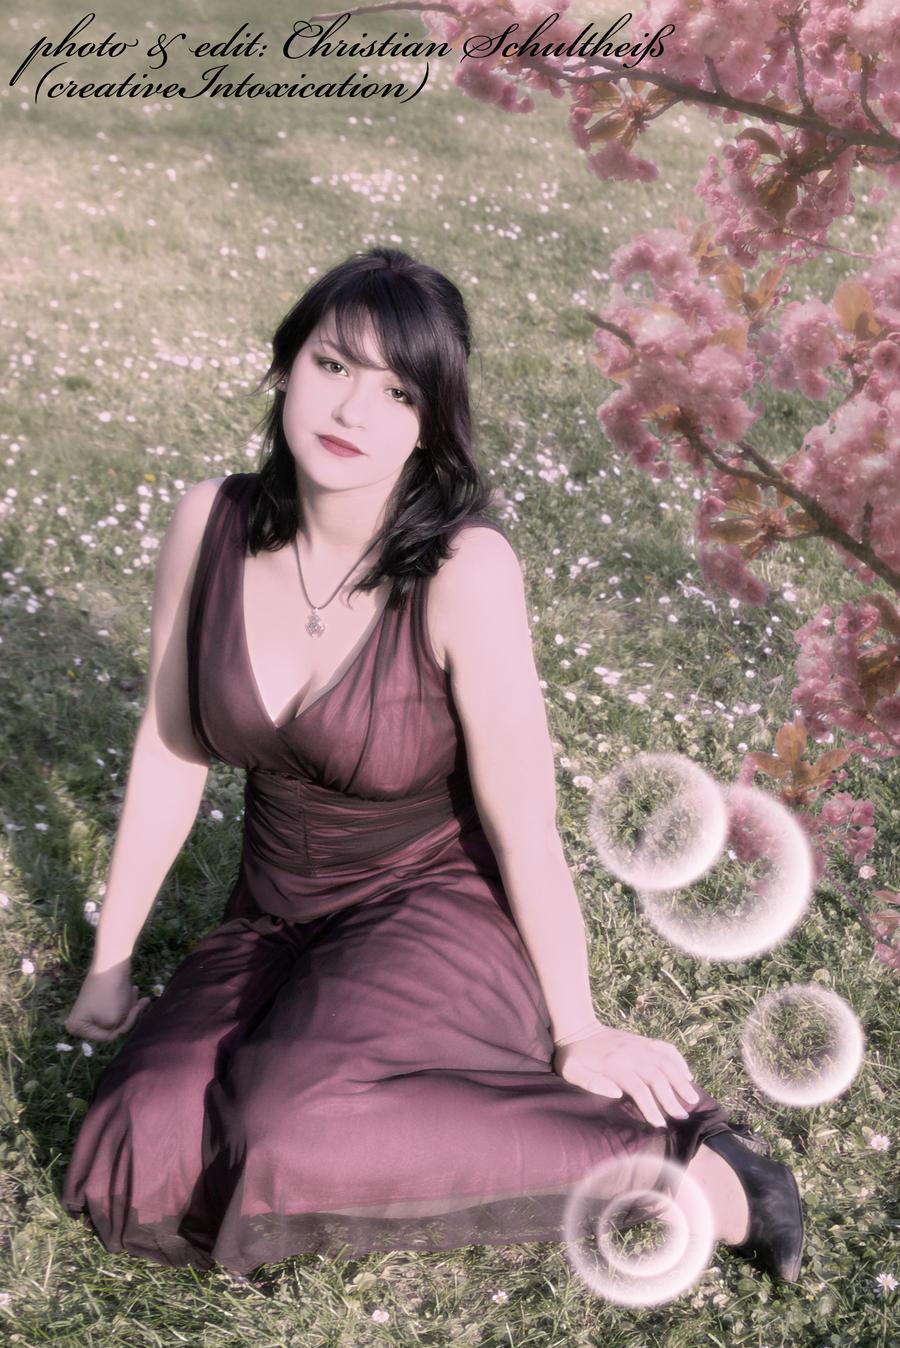 romantic dreamy girl by creativeIntoxication